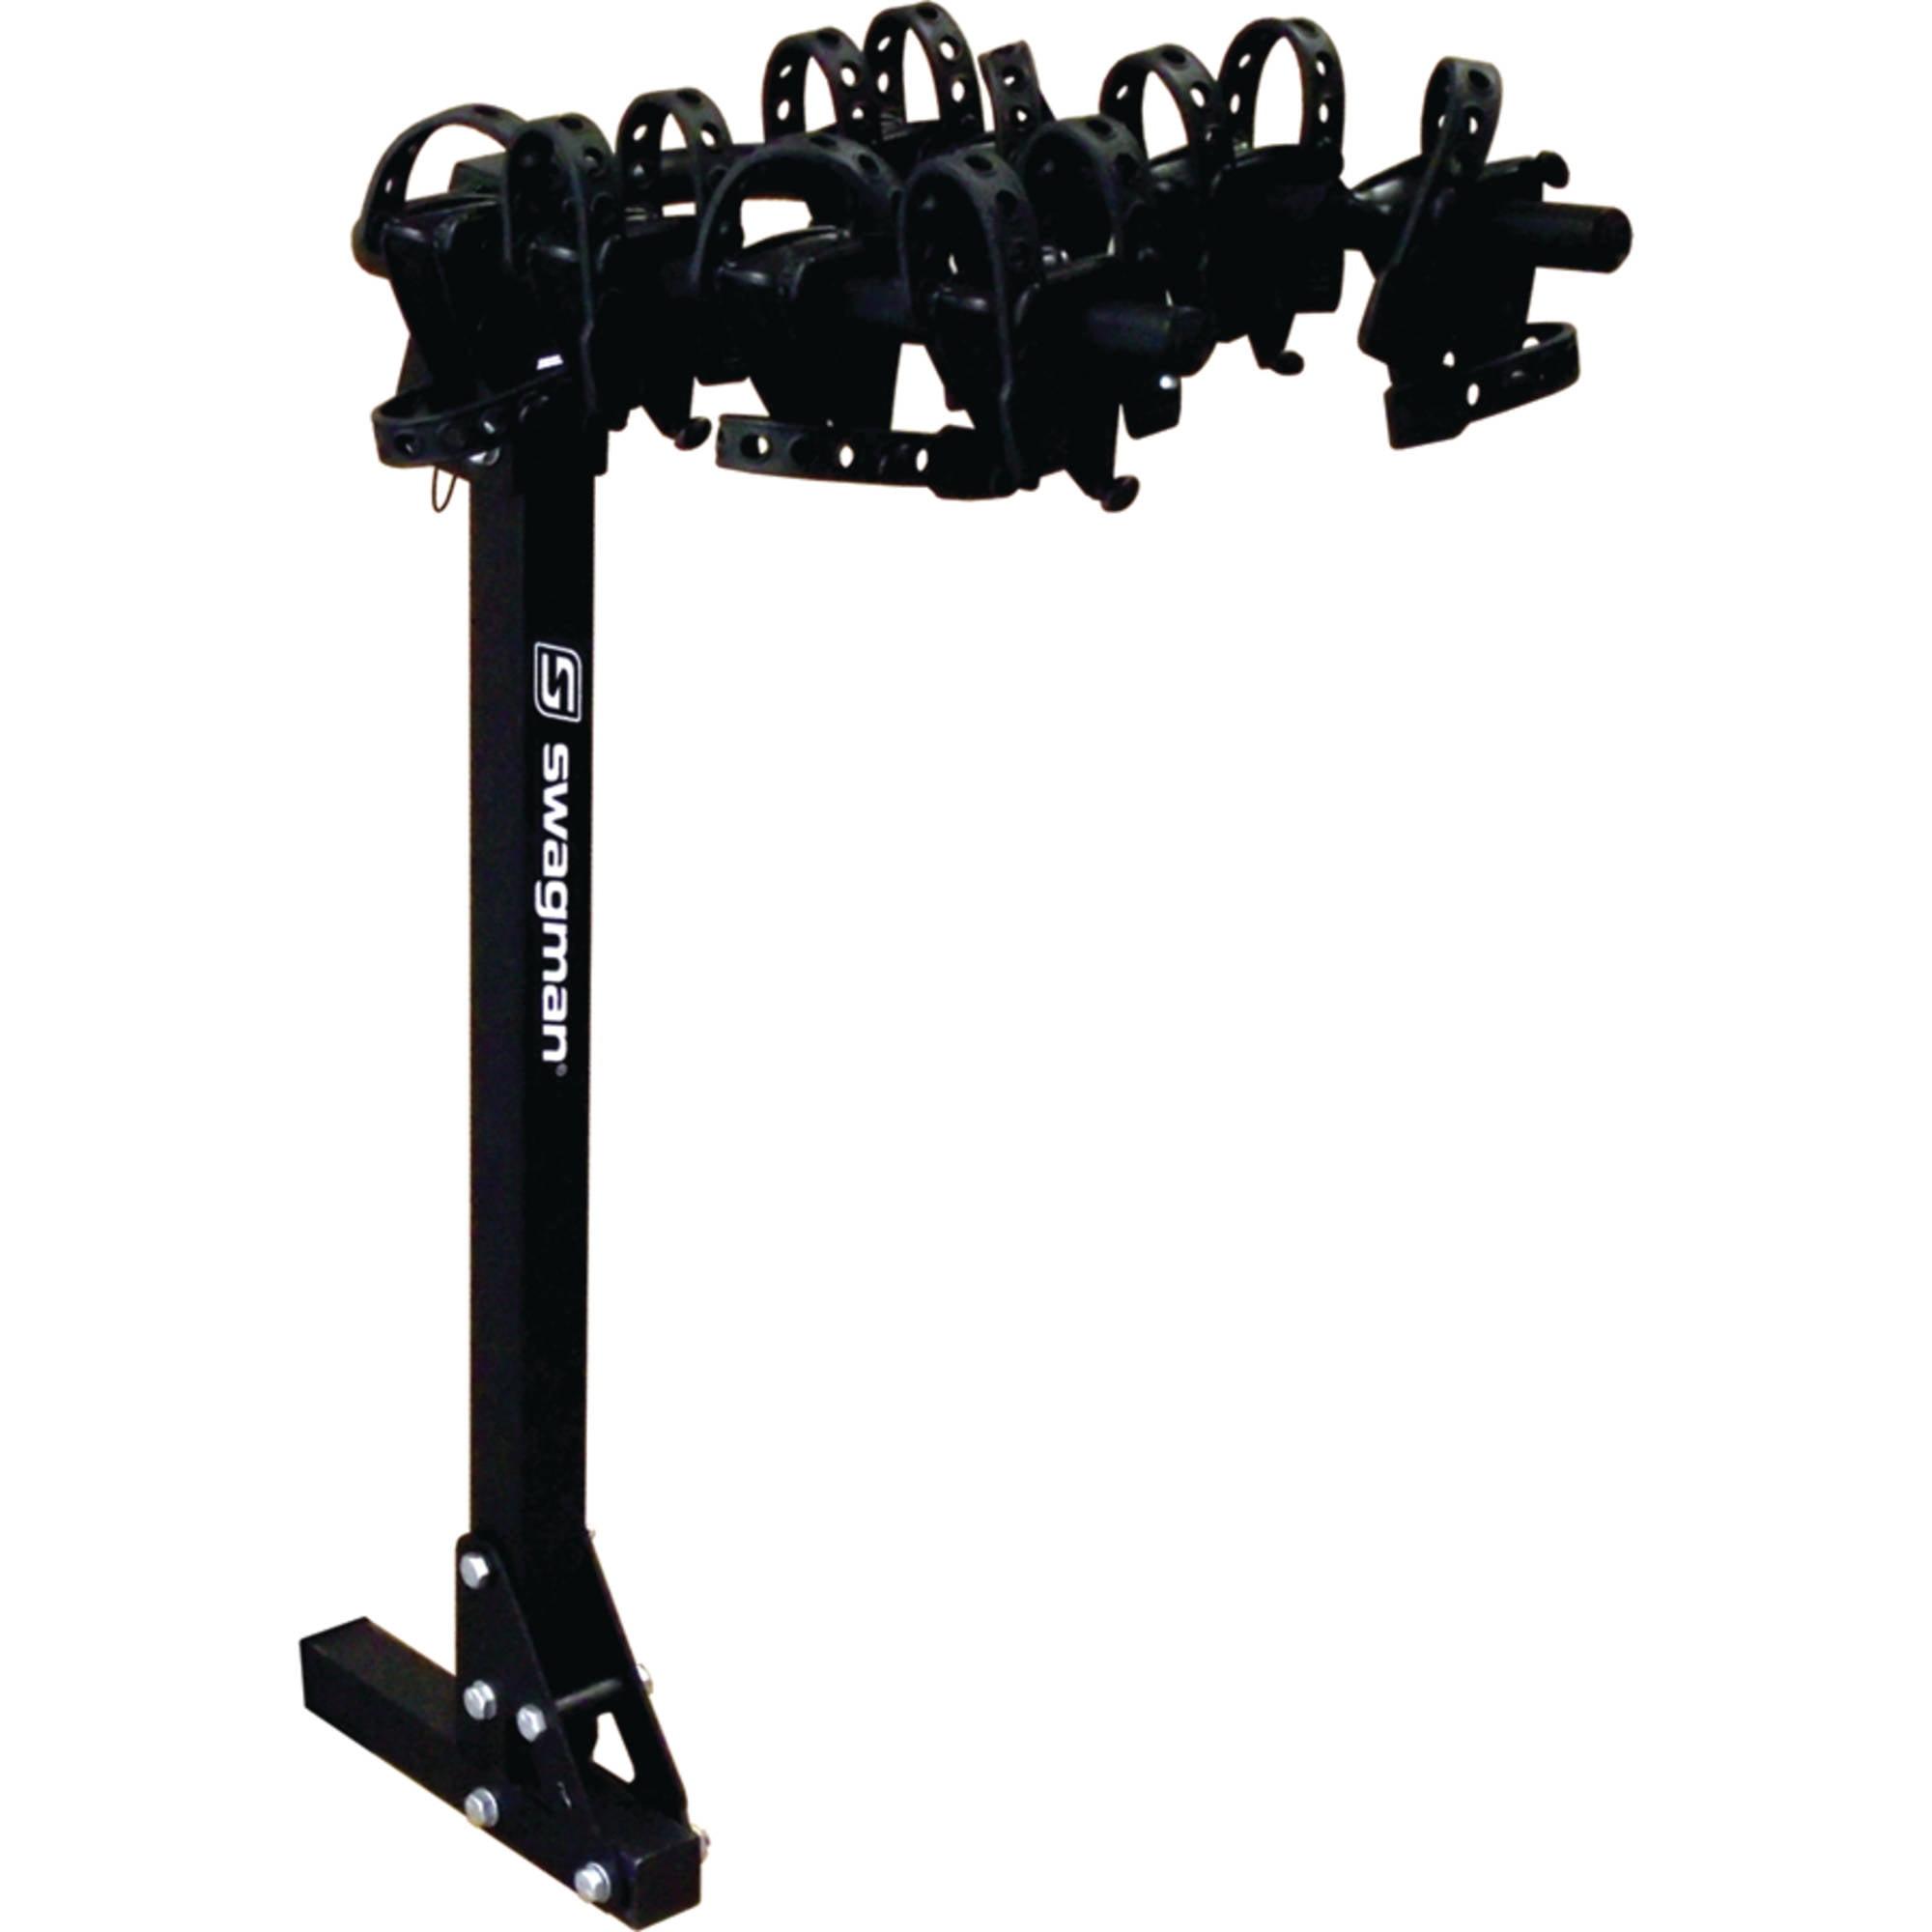 reese walmart carrier rack mount ip bikes sportwing hitch com carry power bike